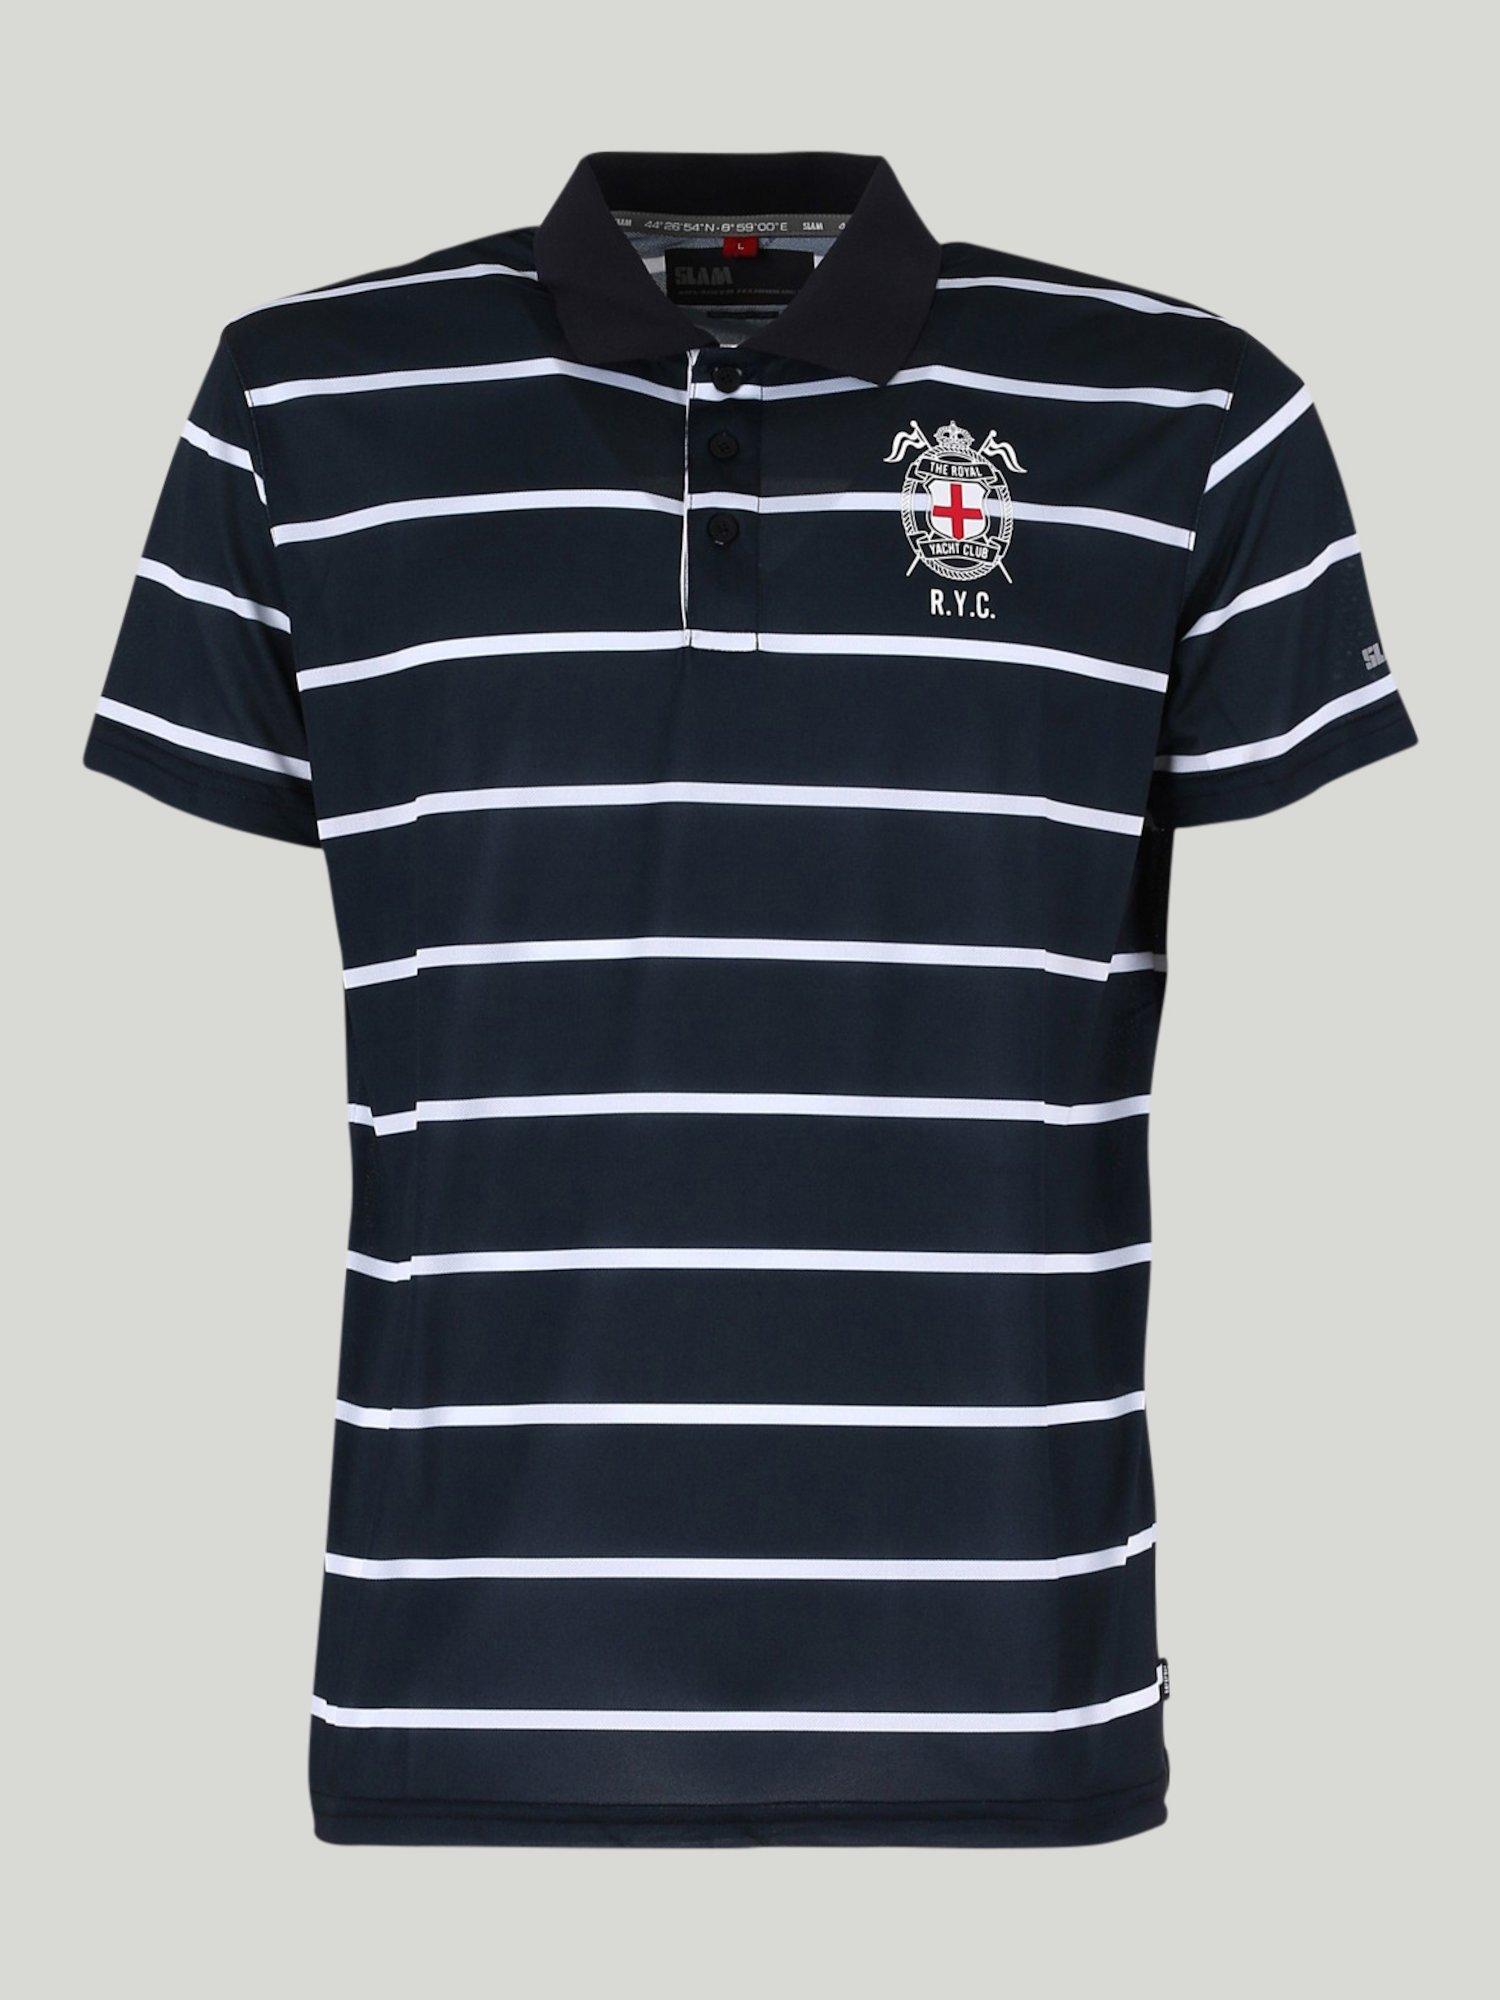 Catcher polo shirt - Navy